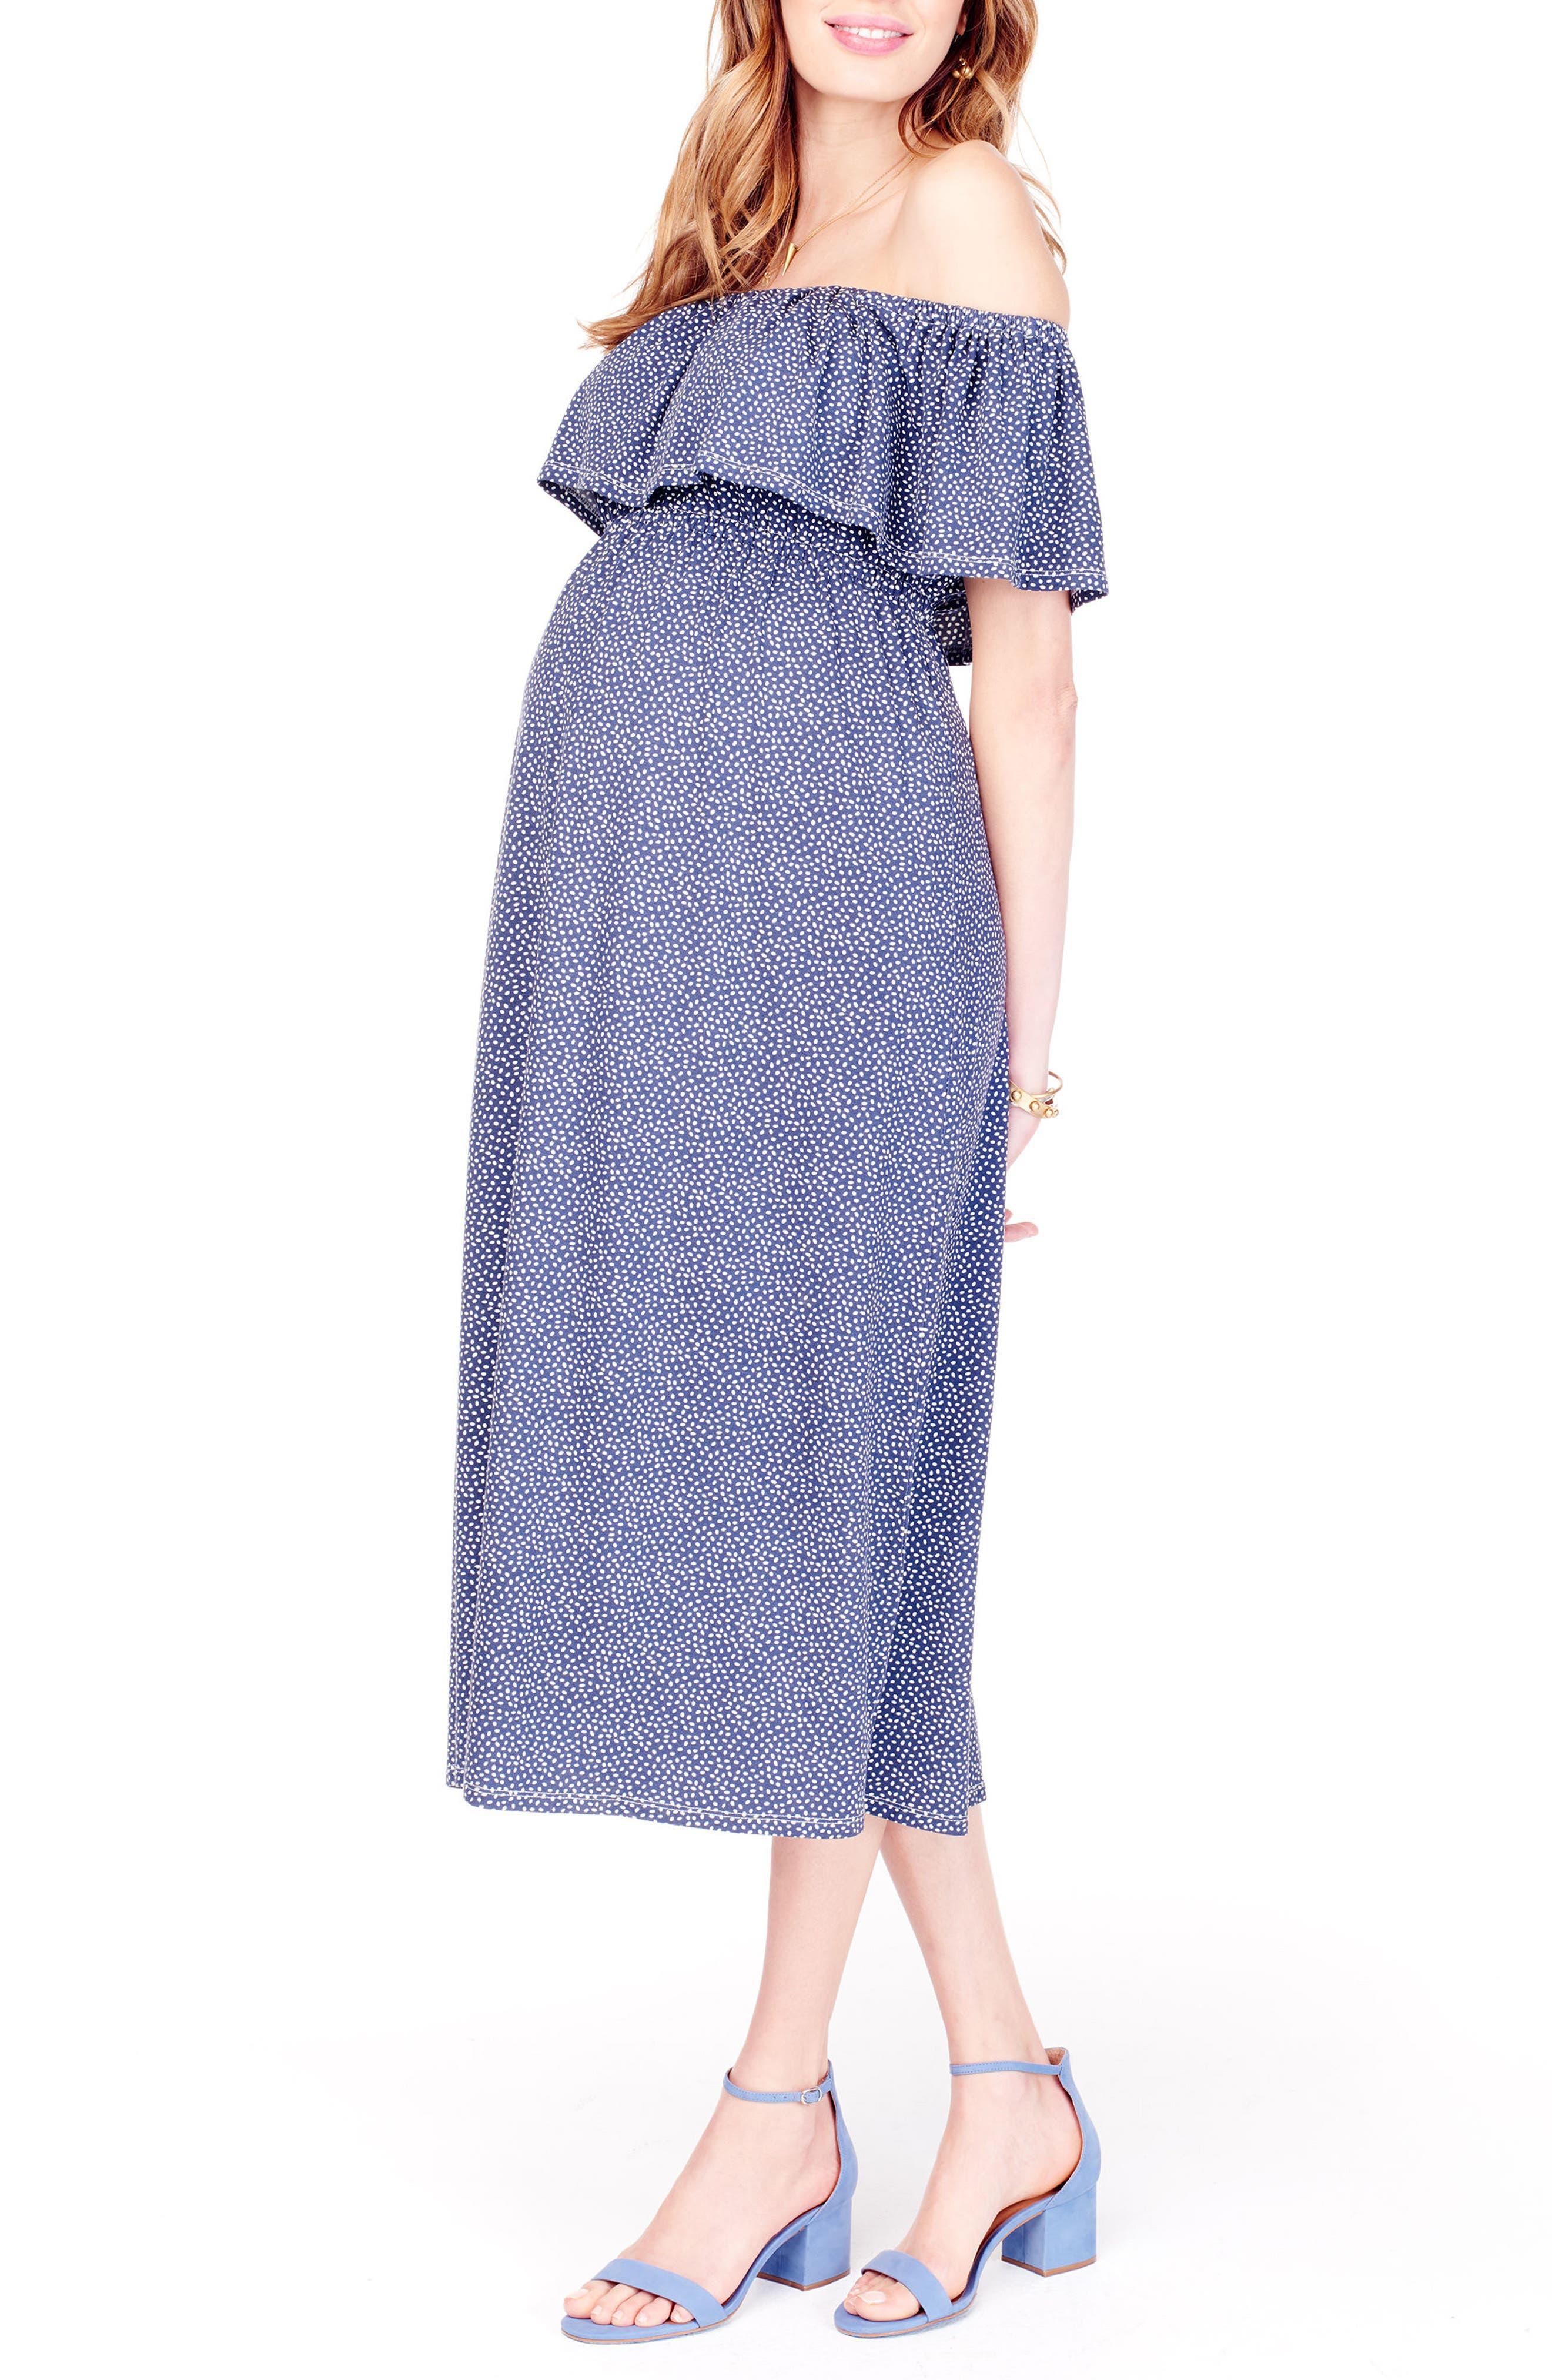 Off the Shoulder Maternity Midi Dress,                             Alternate thumbnail 3, color,                             NAVY TOSSED PETAL